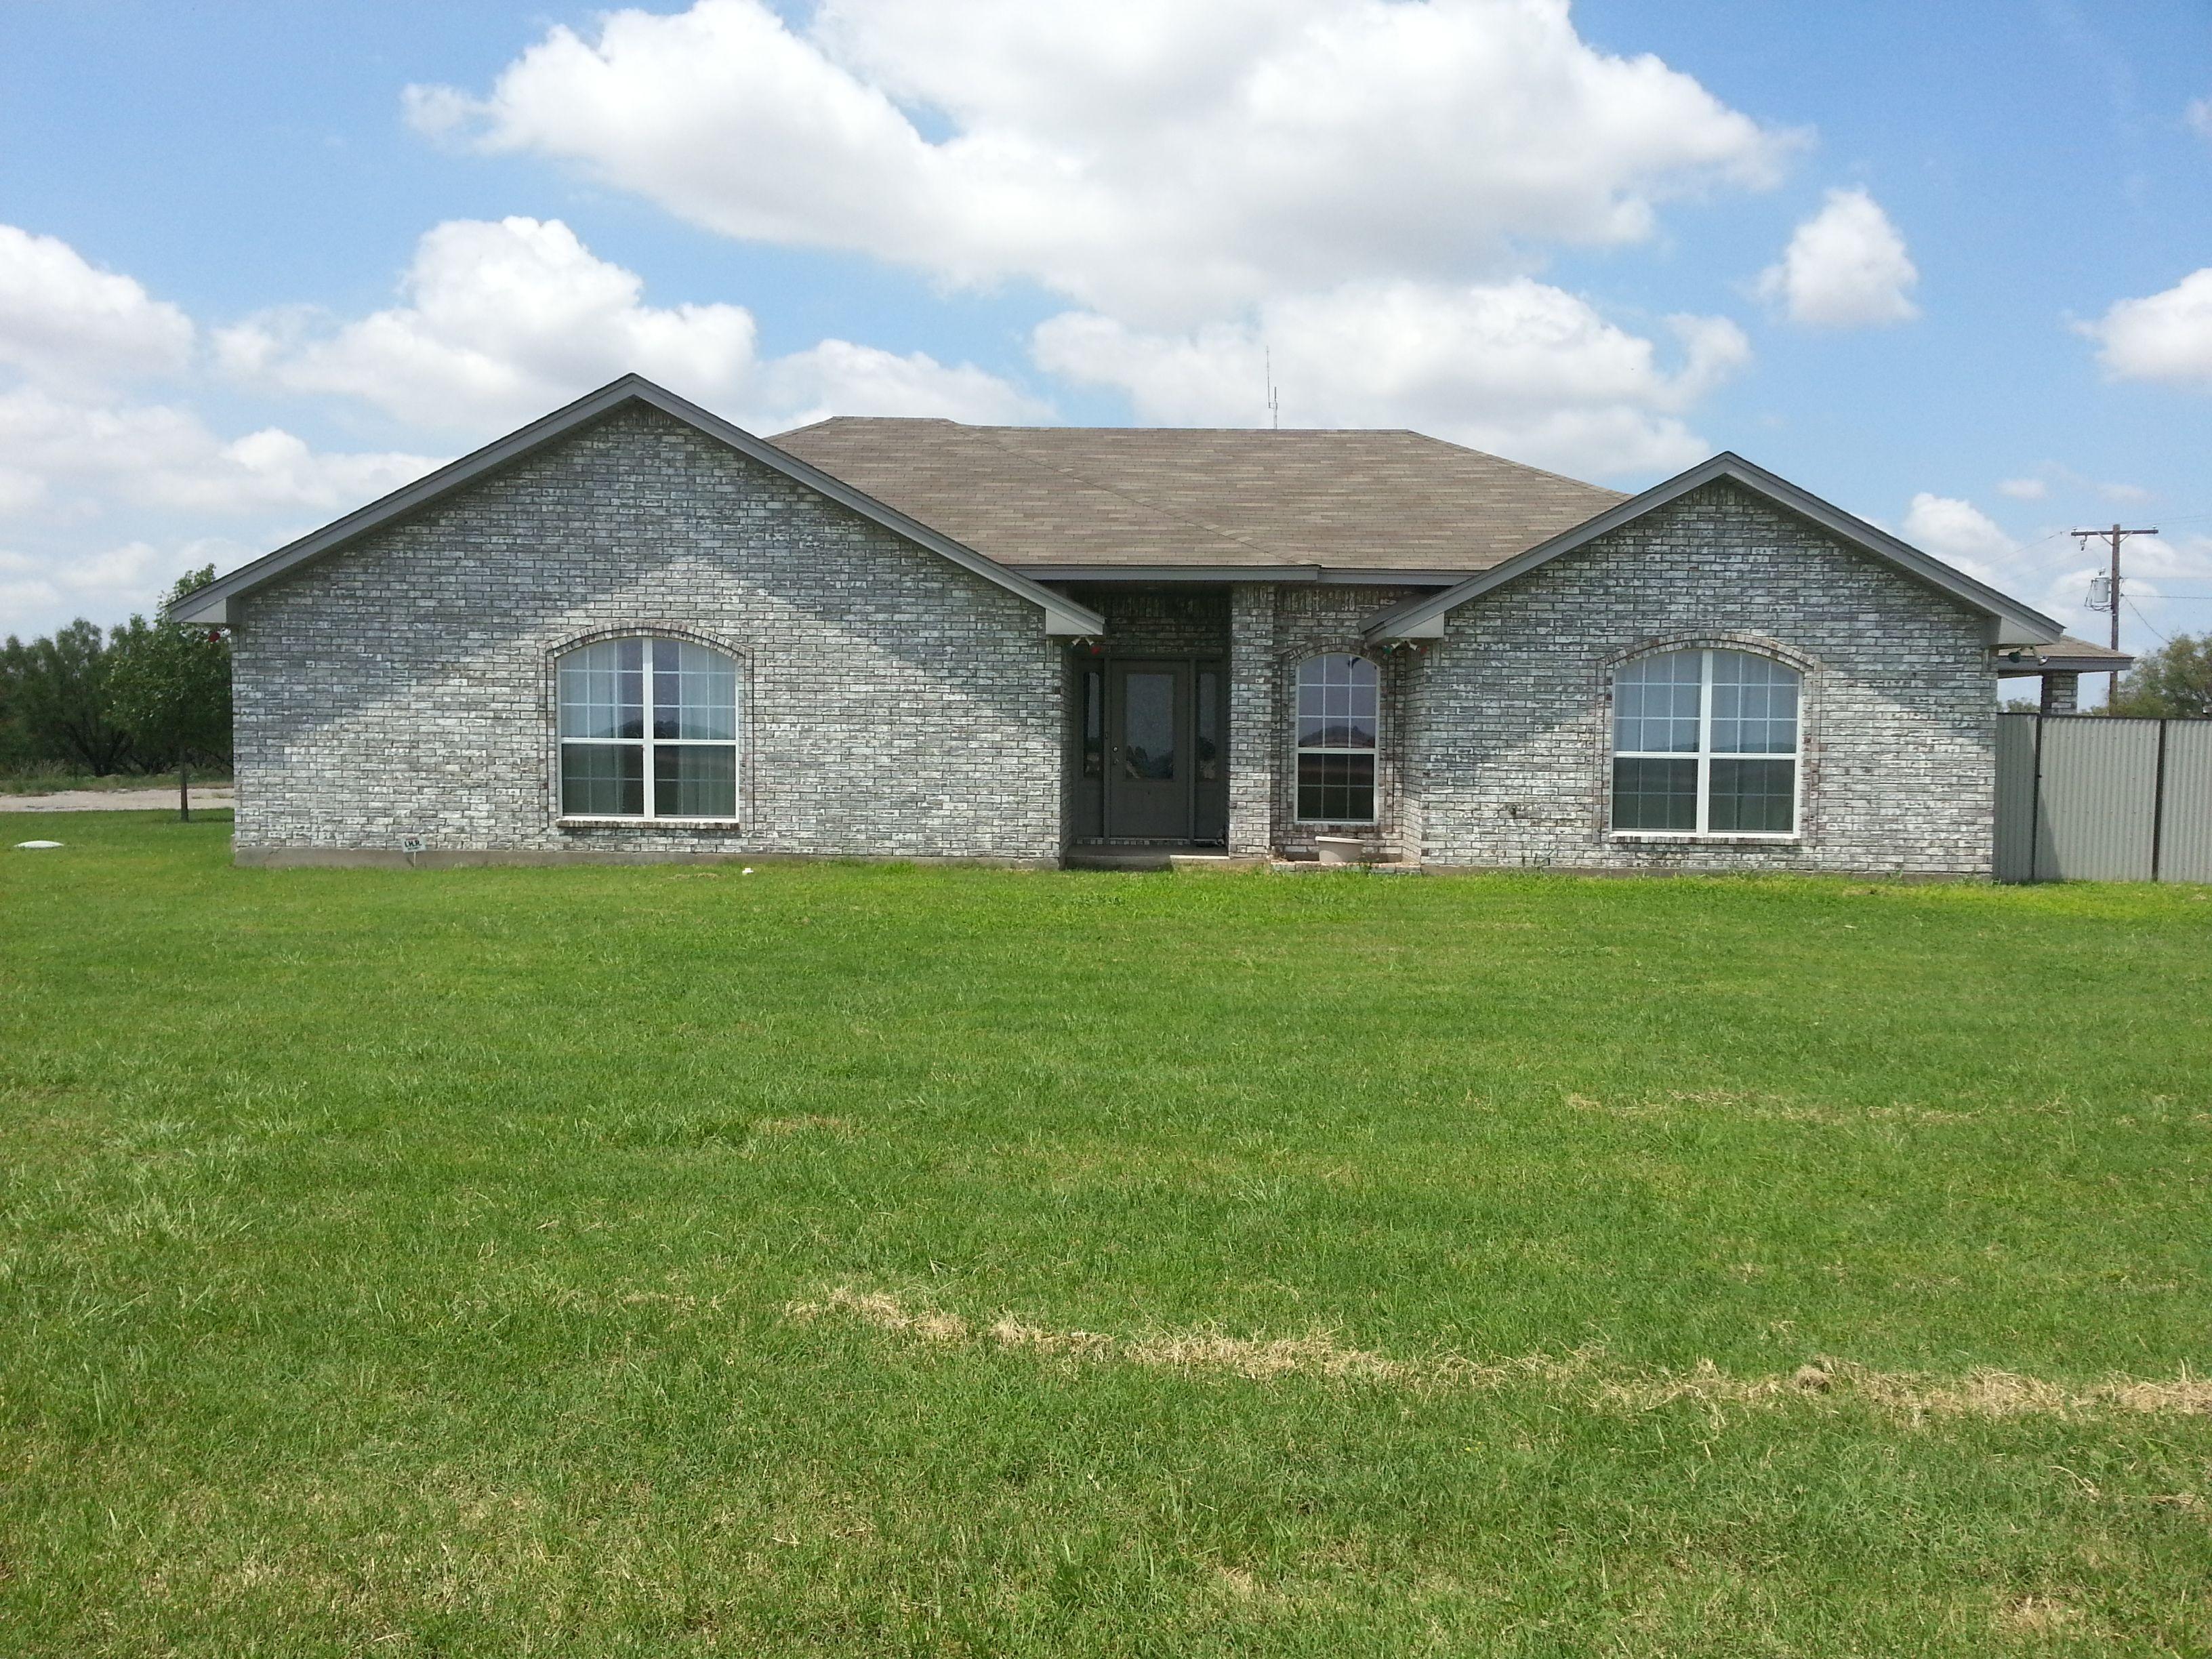 Priced below tax appraisal. Fabulous custom built home on